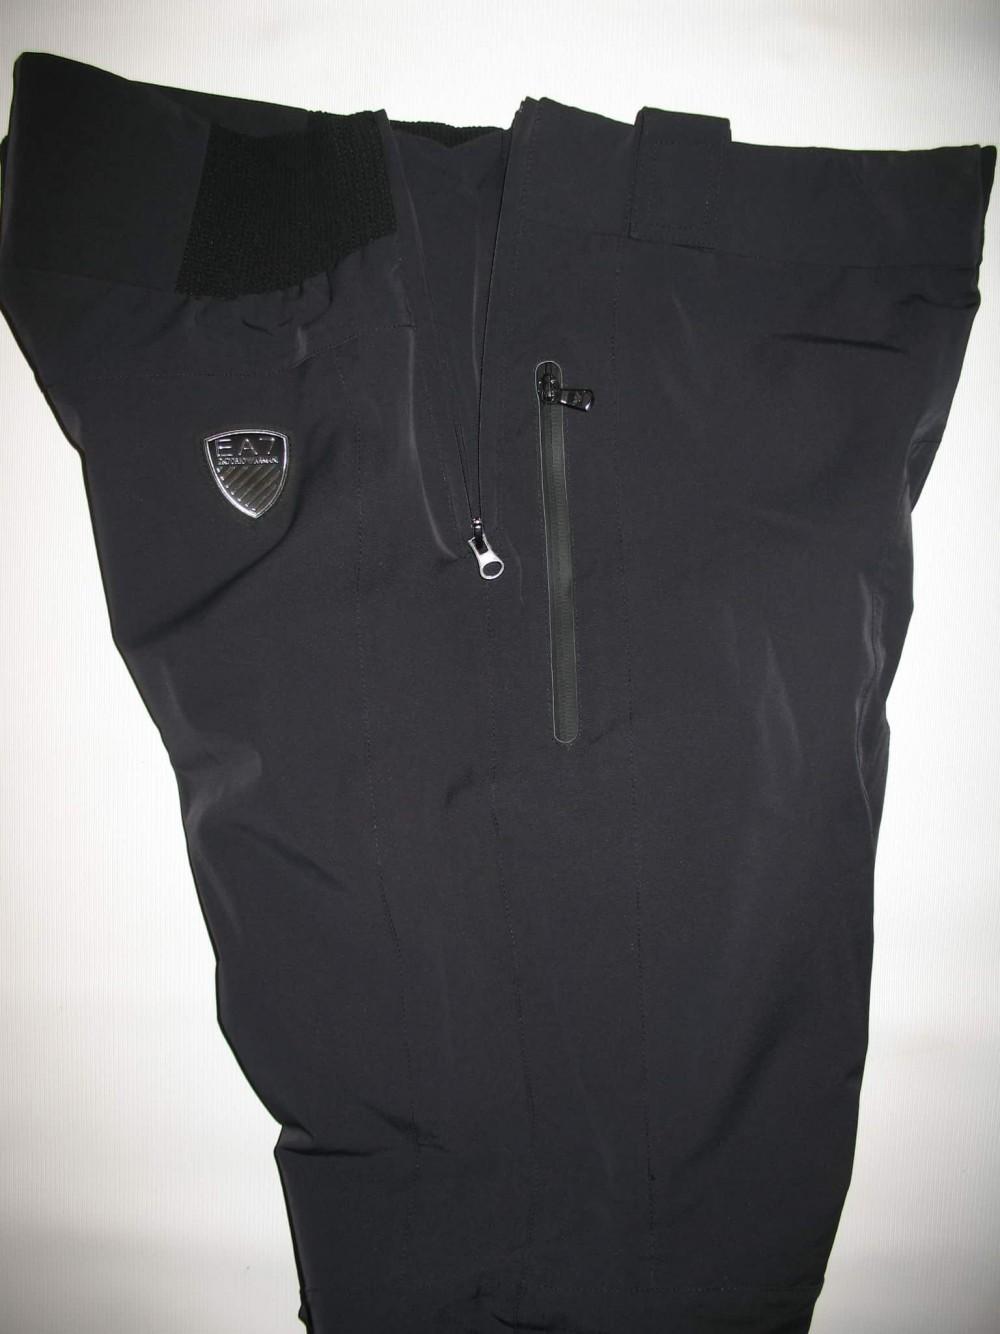 Штаны EA7 emporio armani ski bib pants ( размер XL) - 11